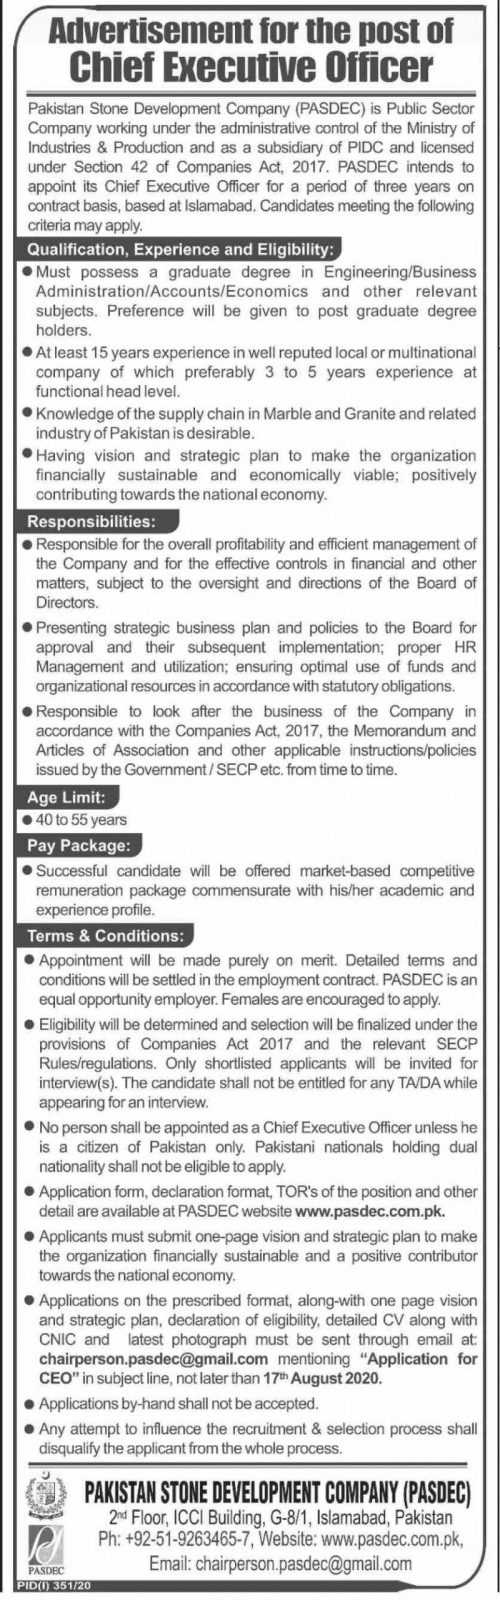 Pakistan Stone Development Company (PASDEC) Jobs 2020